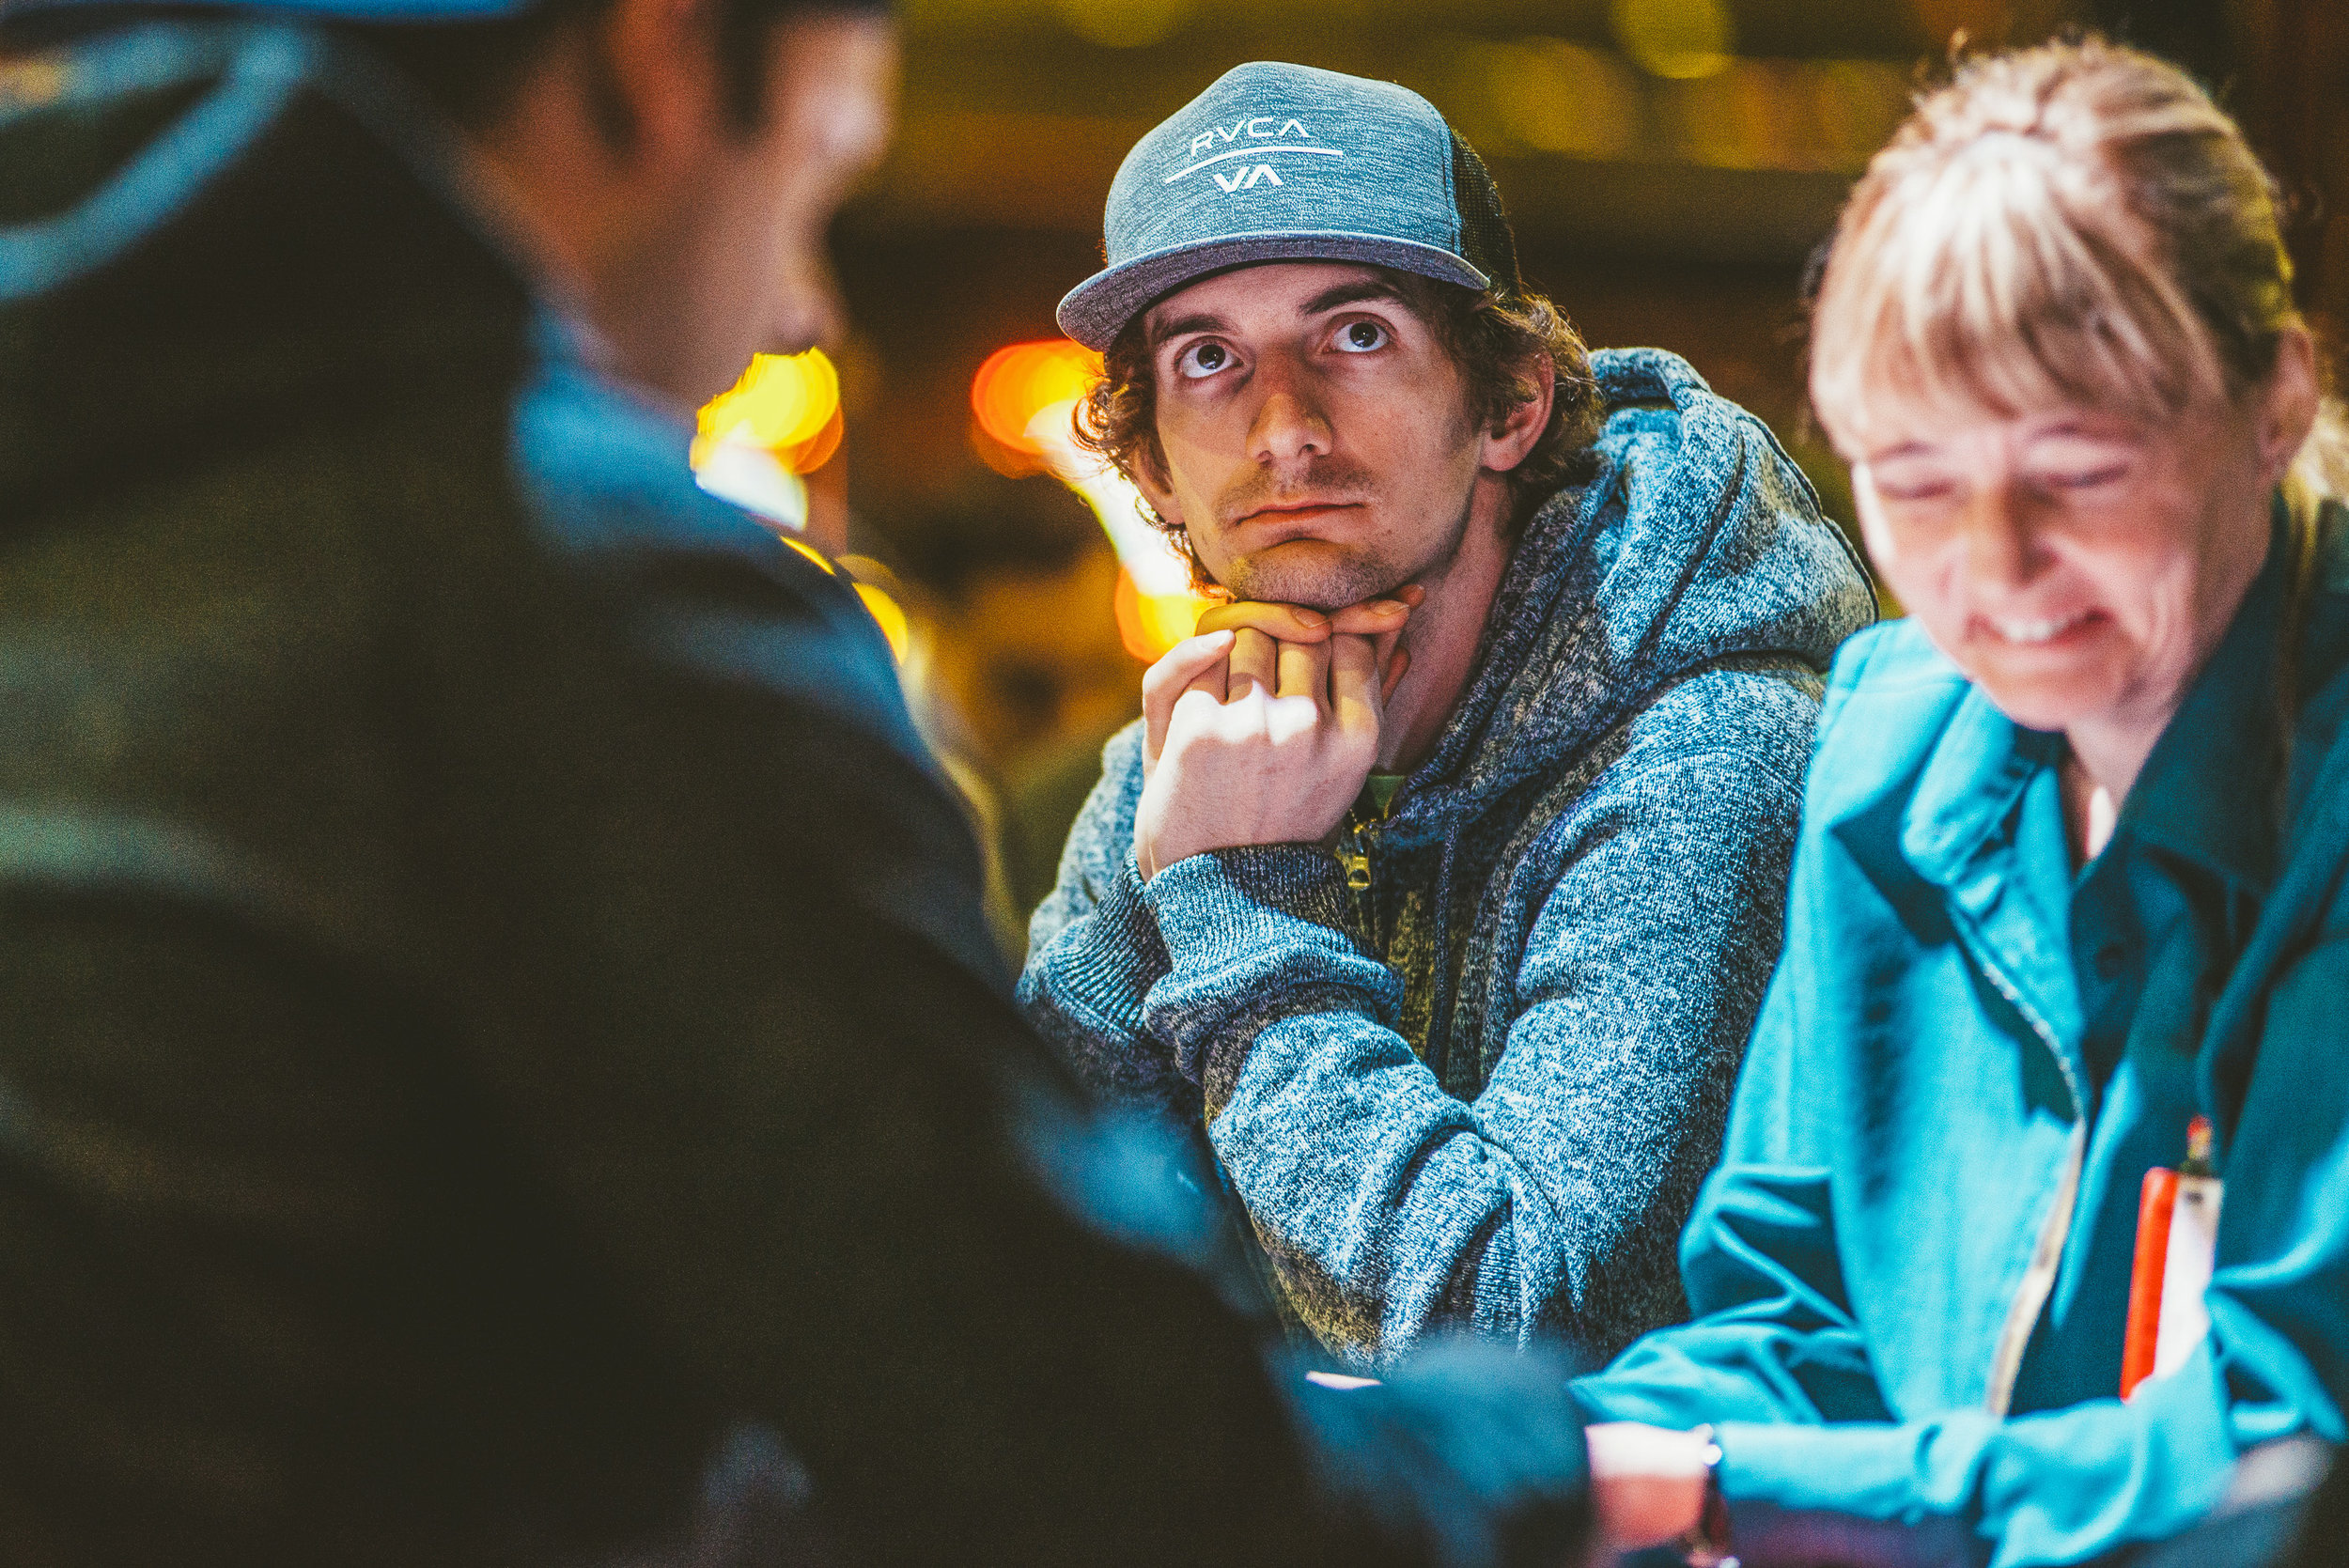 DeepStacks Poker Tour_Mike Smith_Amato_AA41773.jpg